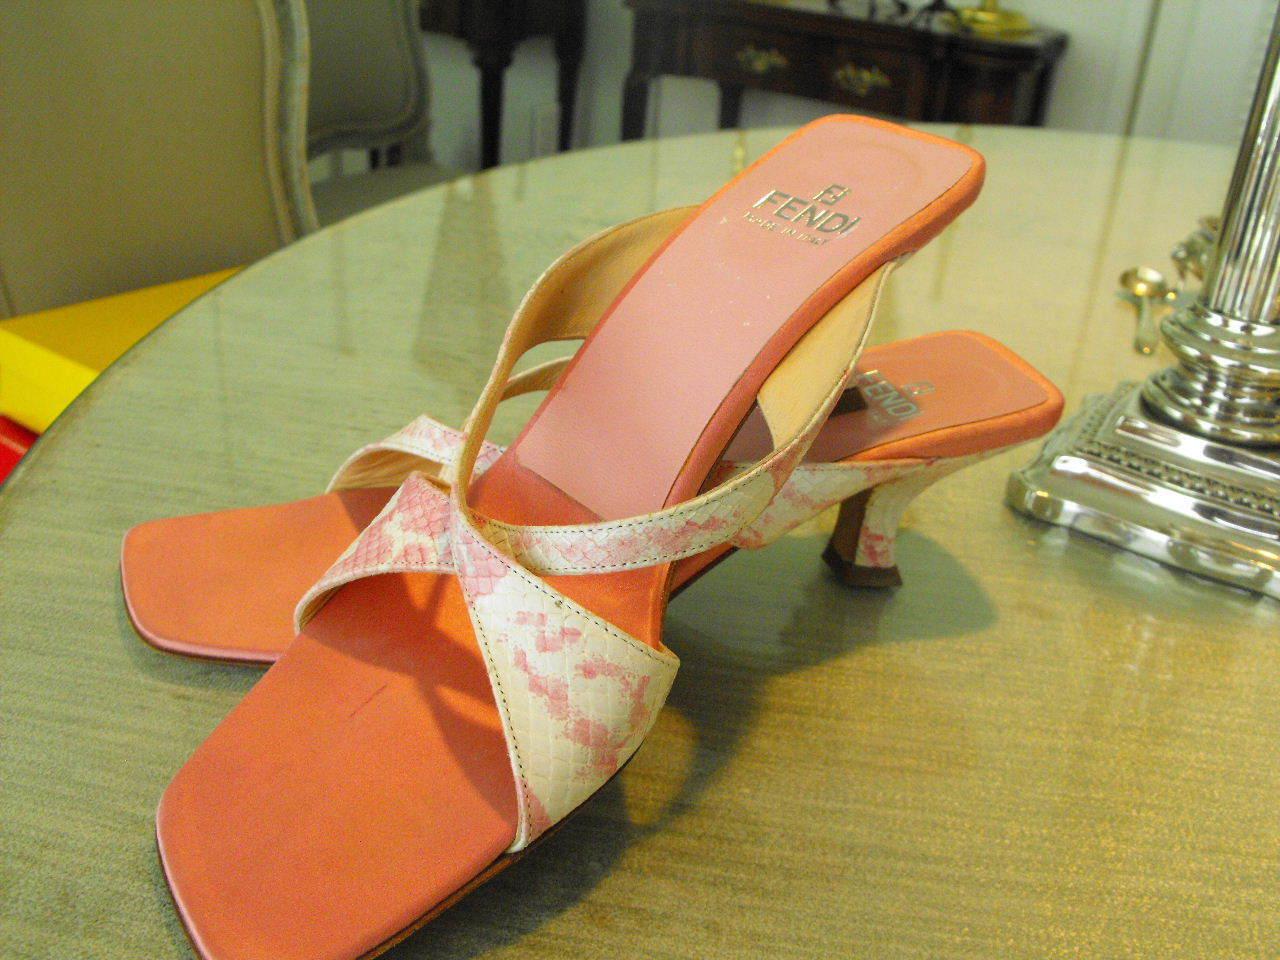 Delicious FENDI () Pink White Heeled Sandals w Two Lizard Straps & Heels 6M